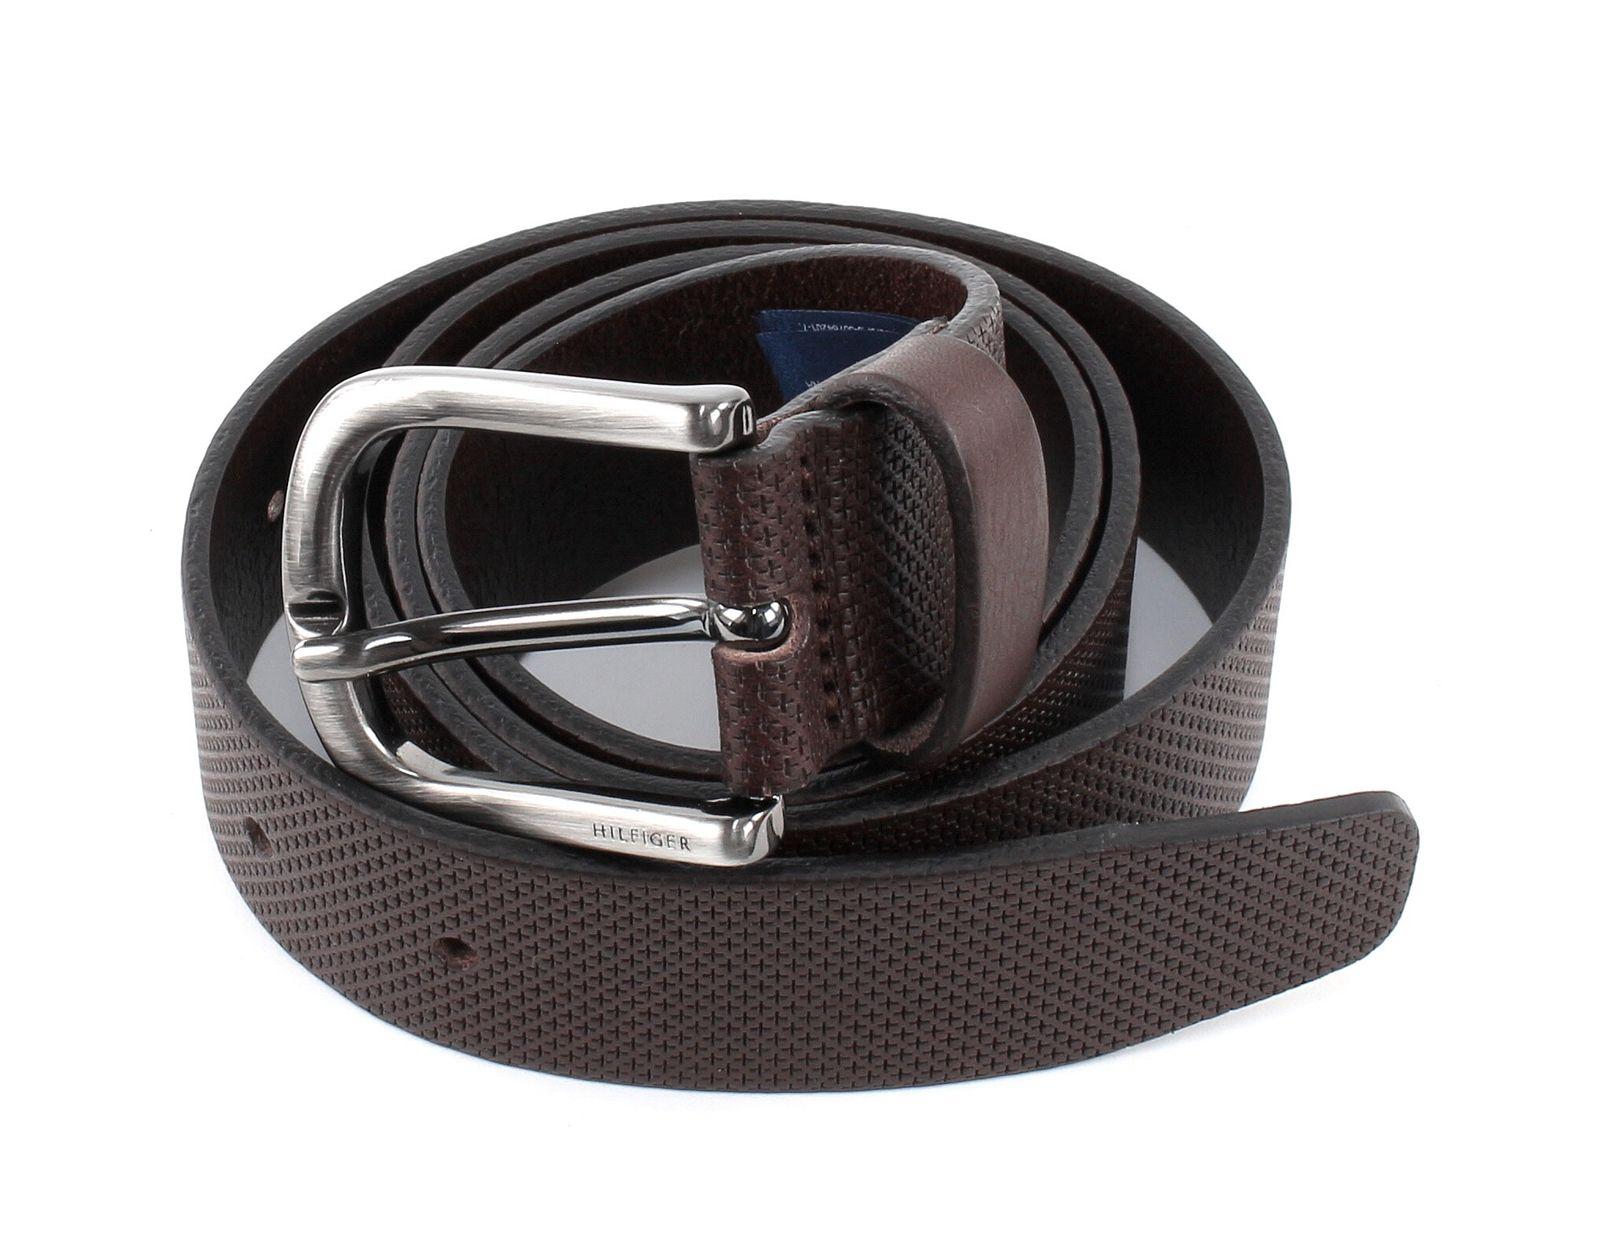 TOMMY HILFIGER Micro Embossed Belt 3.5 W90 Testa Di Moro